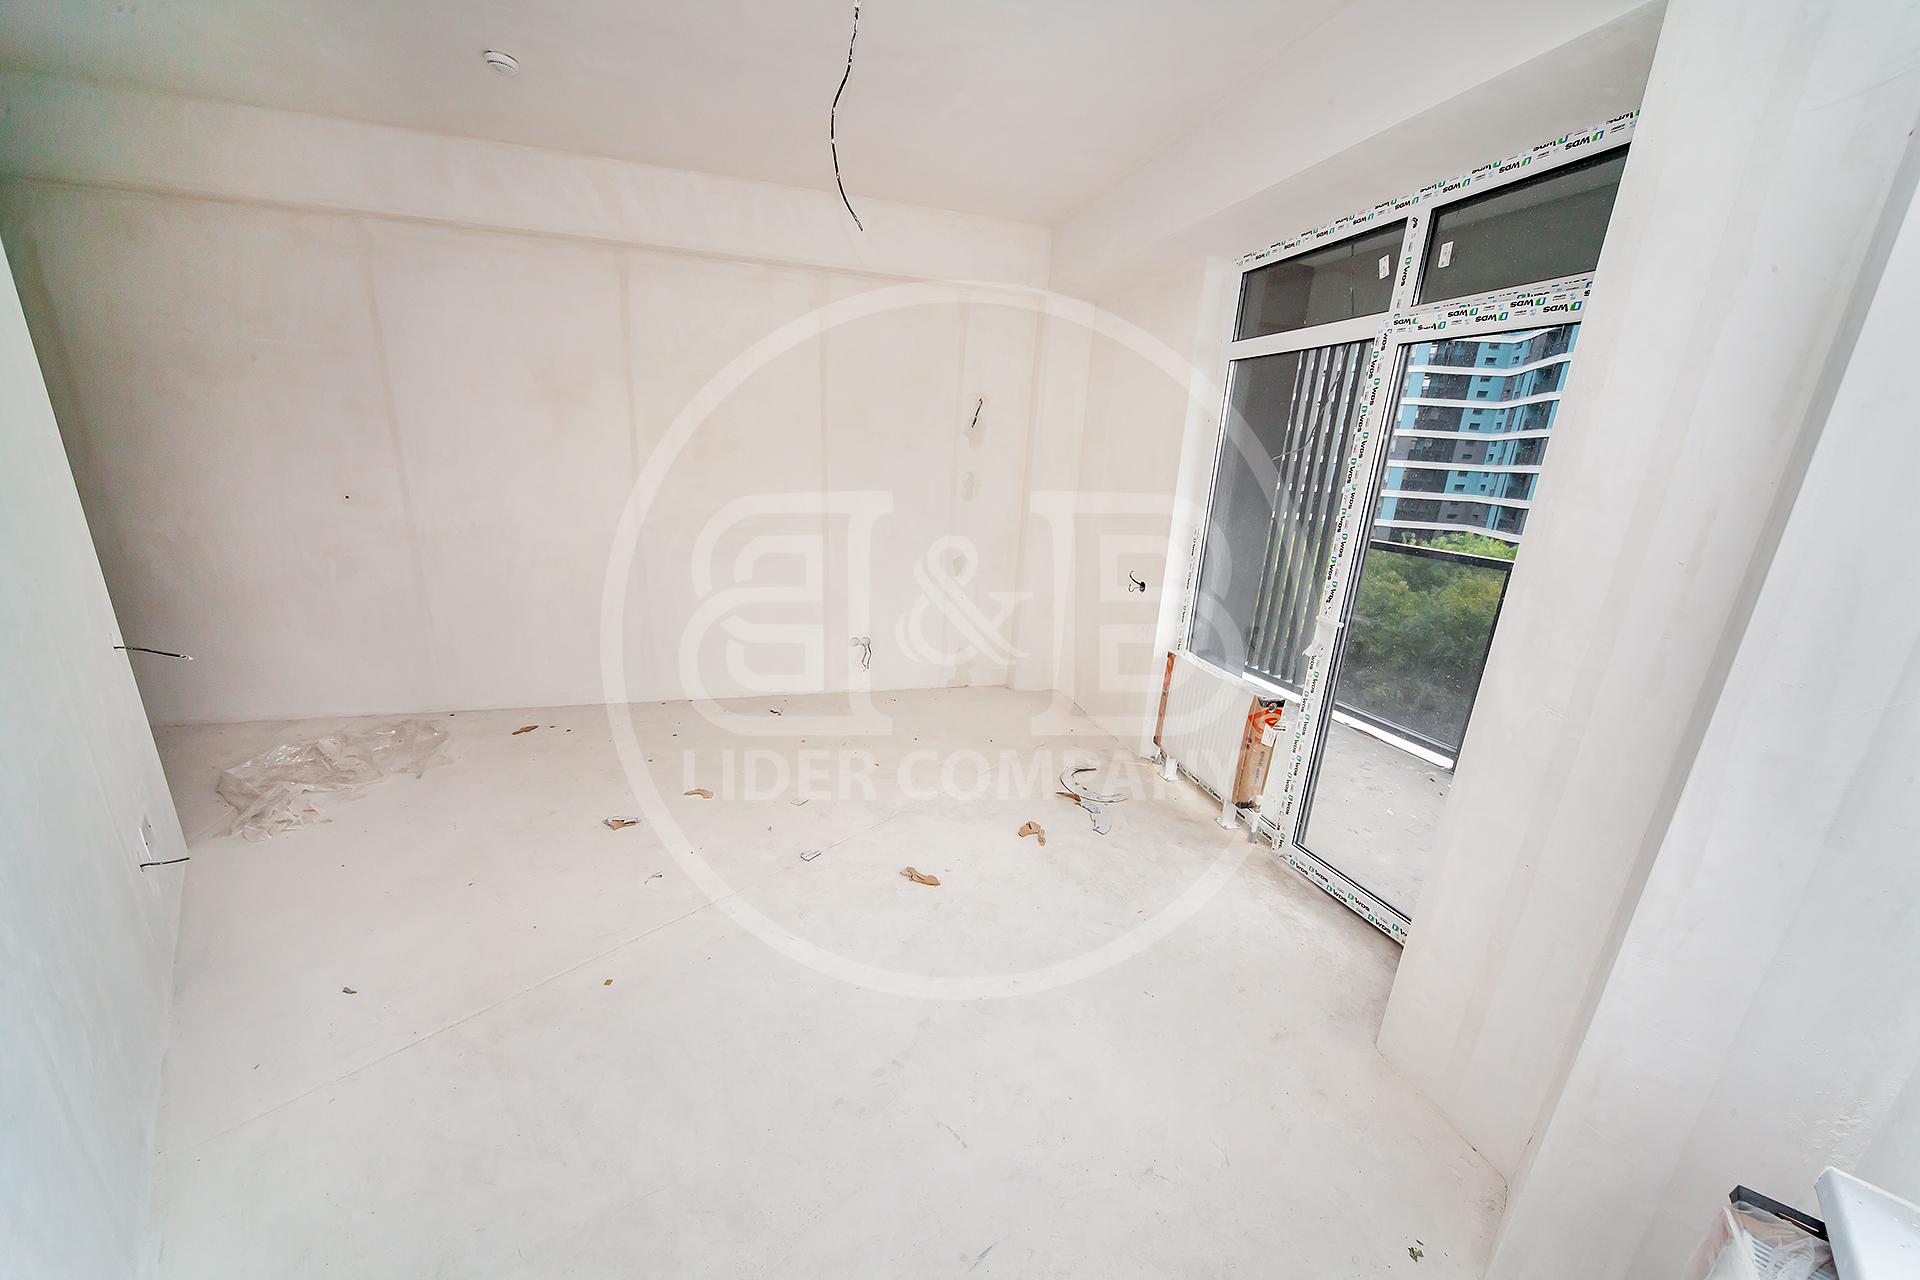 Apartament 106 m2 str. Bogdan Voievod Râșcani variantă albă